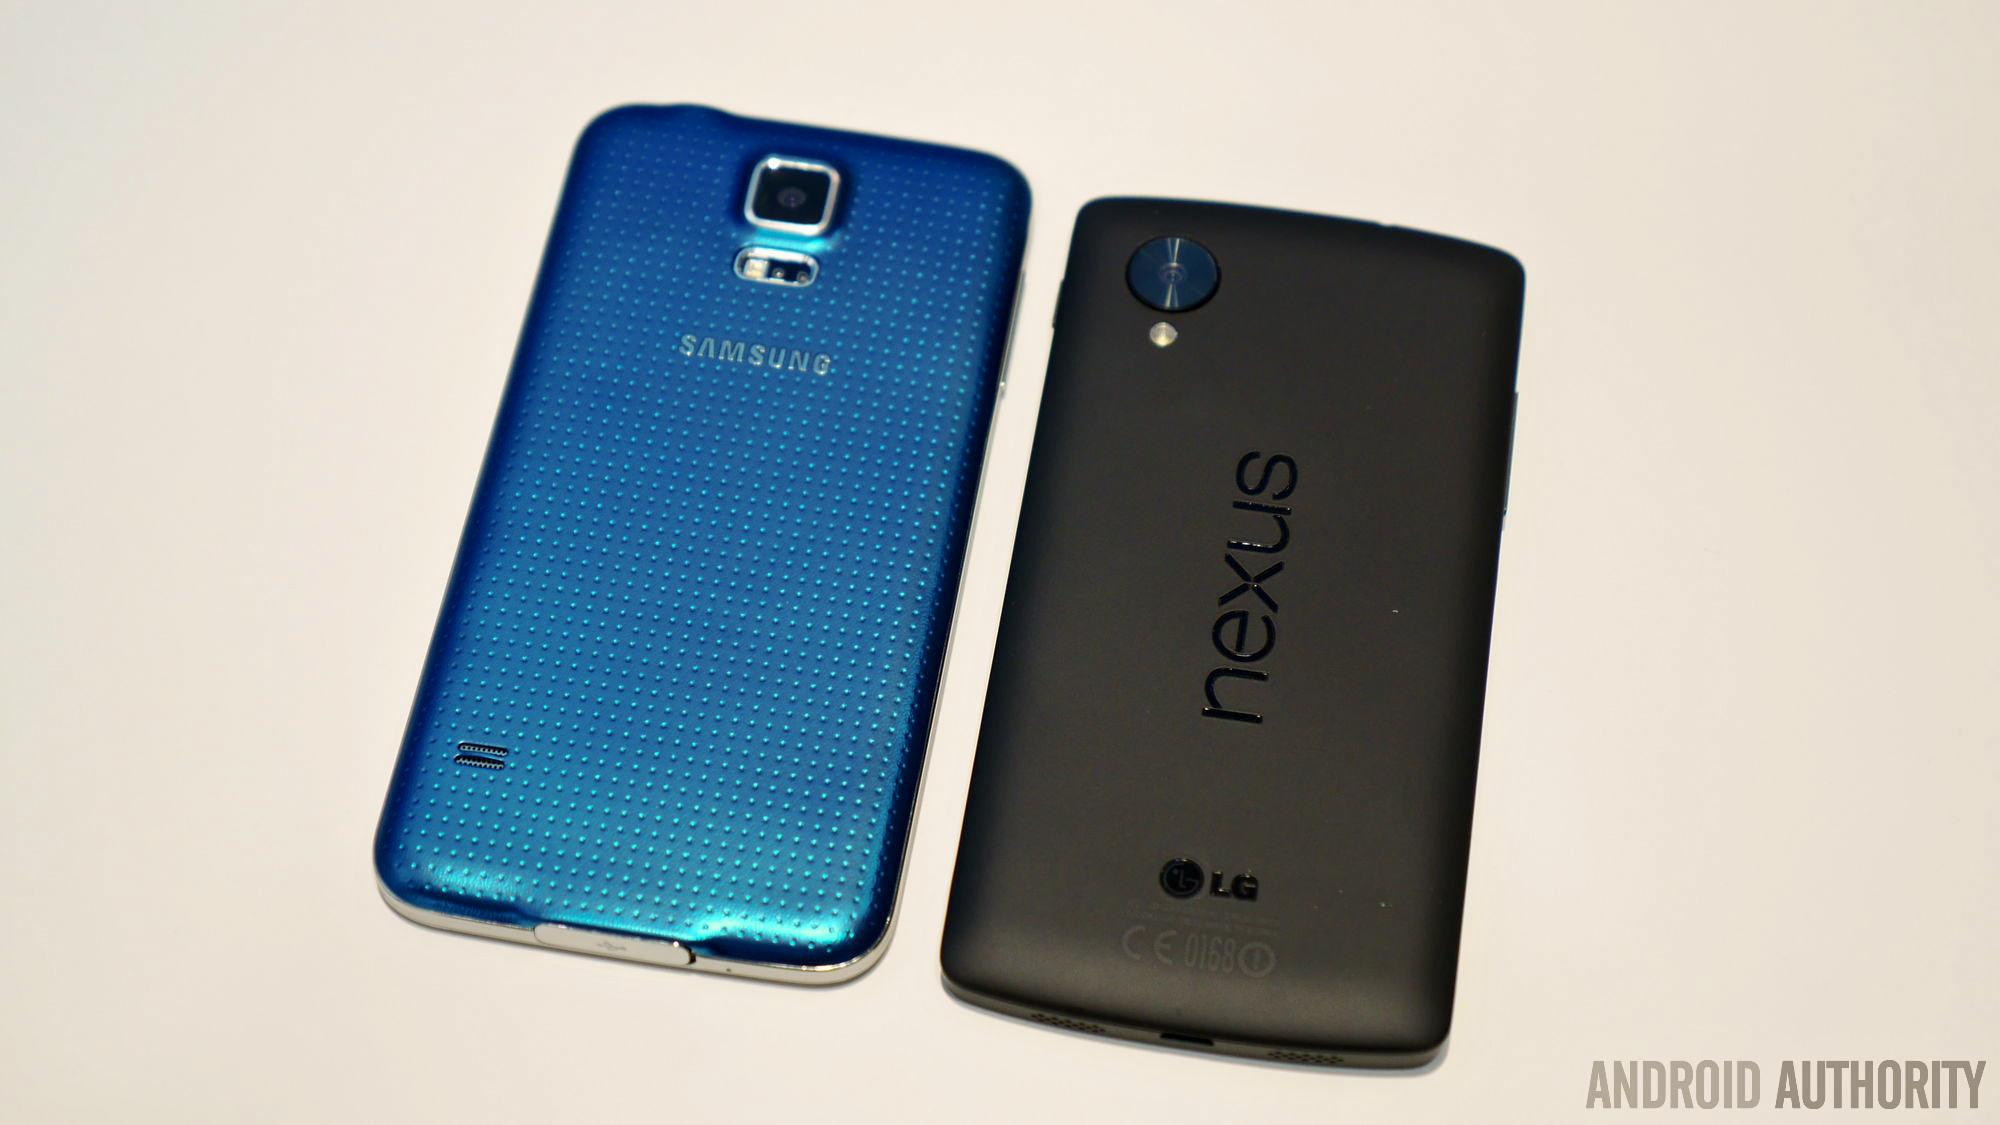 samsung galaxy s5 vs nexus 5 4